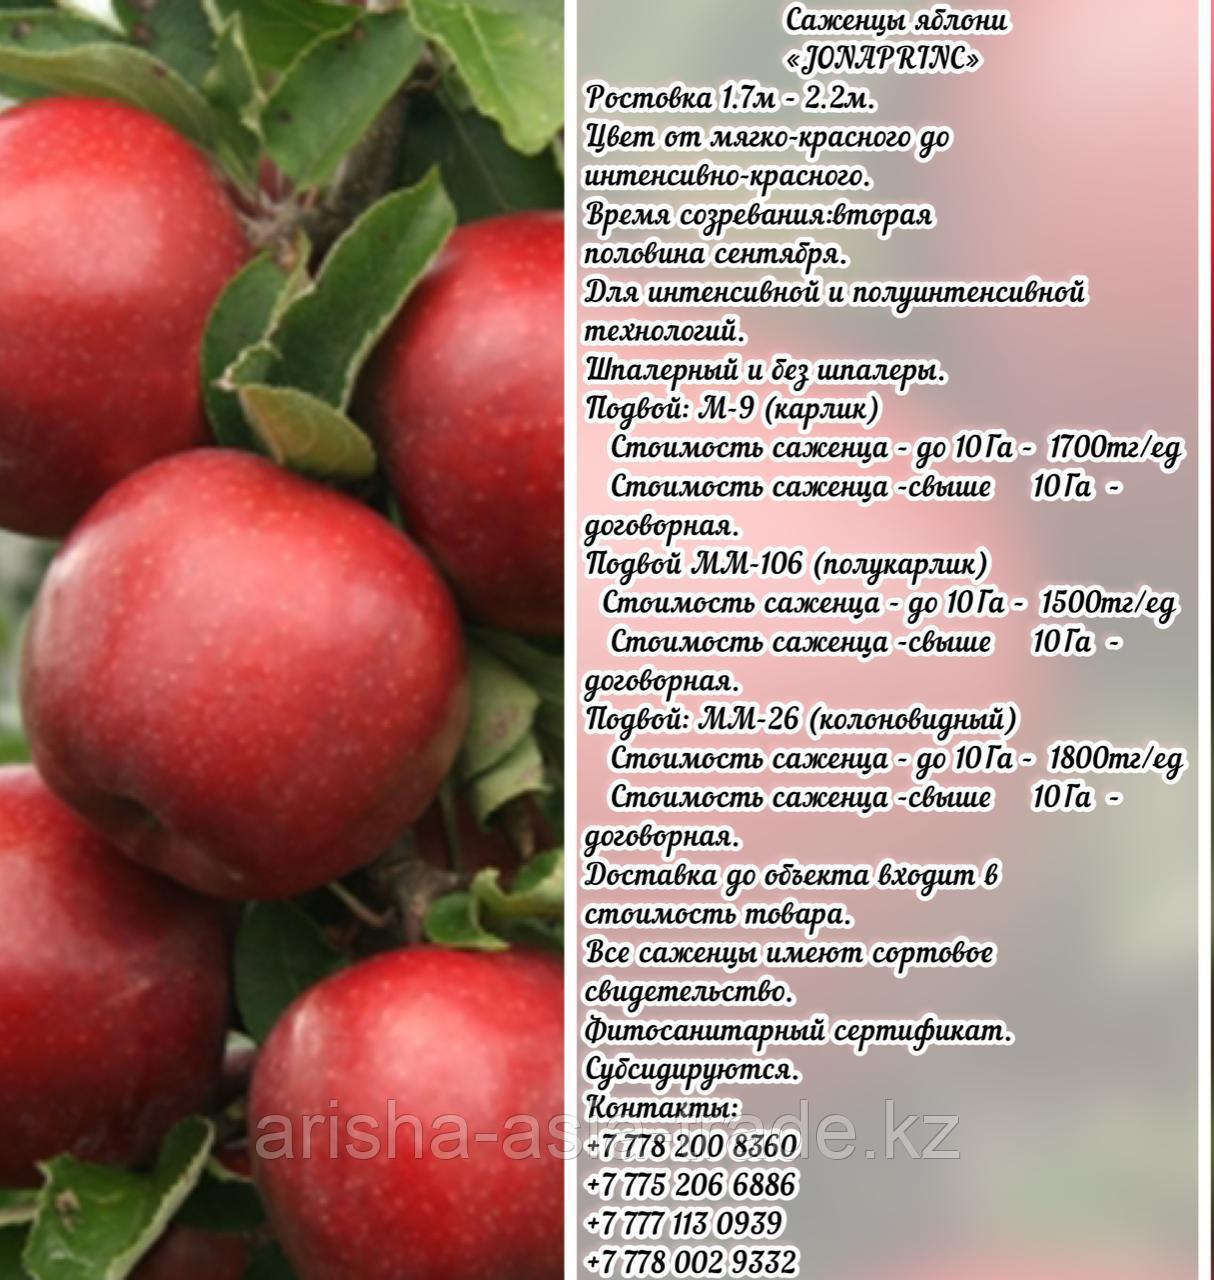 "Саженцы яблони ""Jonaprinc"" (Джонапринц) М 9 Сербия"